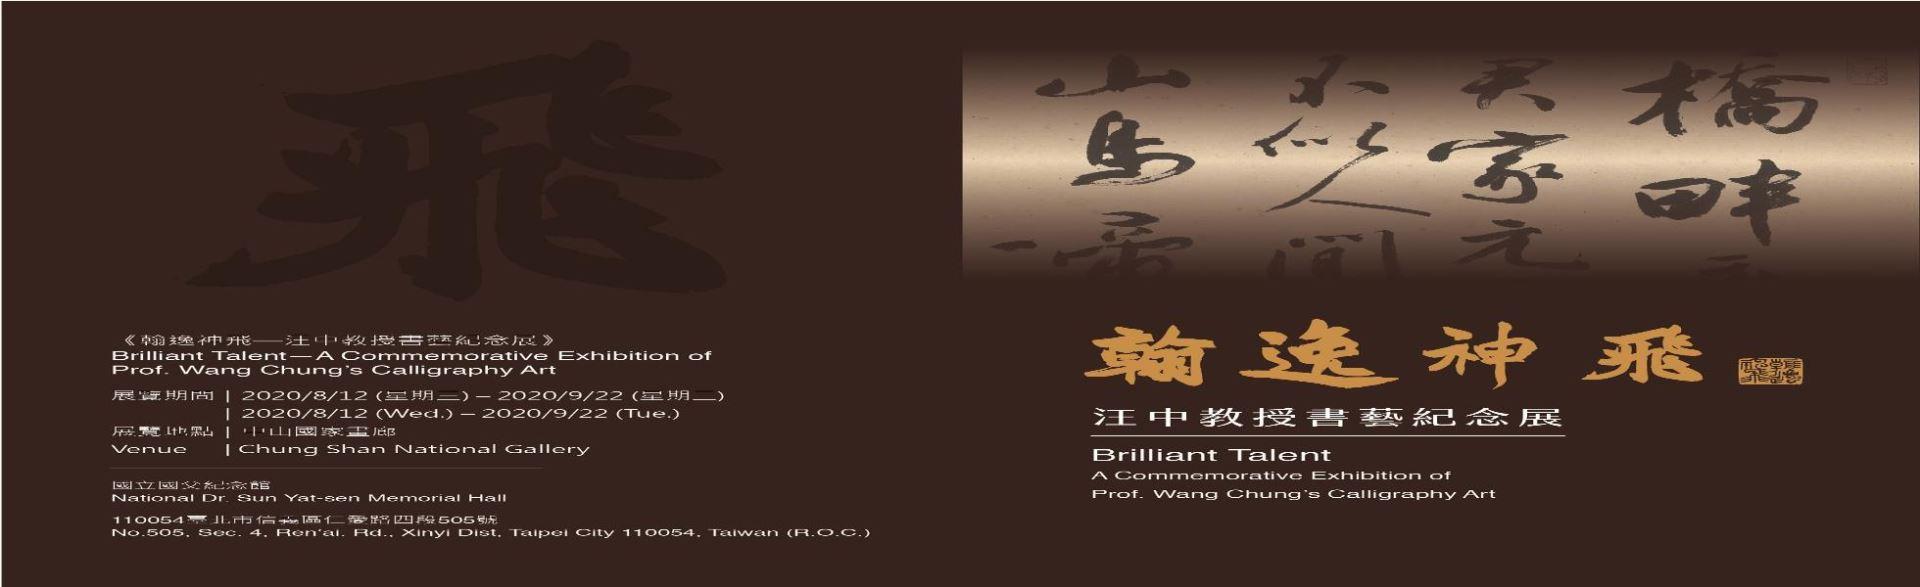 Heavenly Spirit of Calligraphy—Prof. Wang Zhong's Calligraphy Art Memorial Exhibition「open a new window」